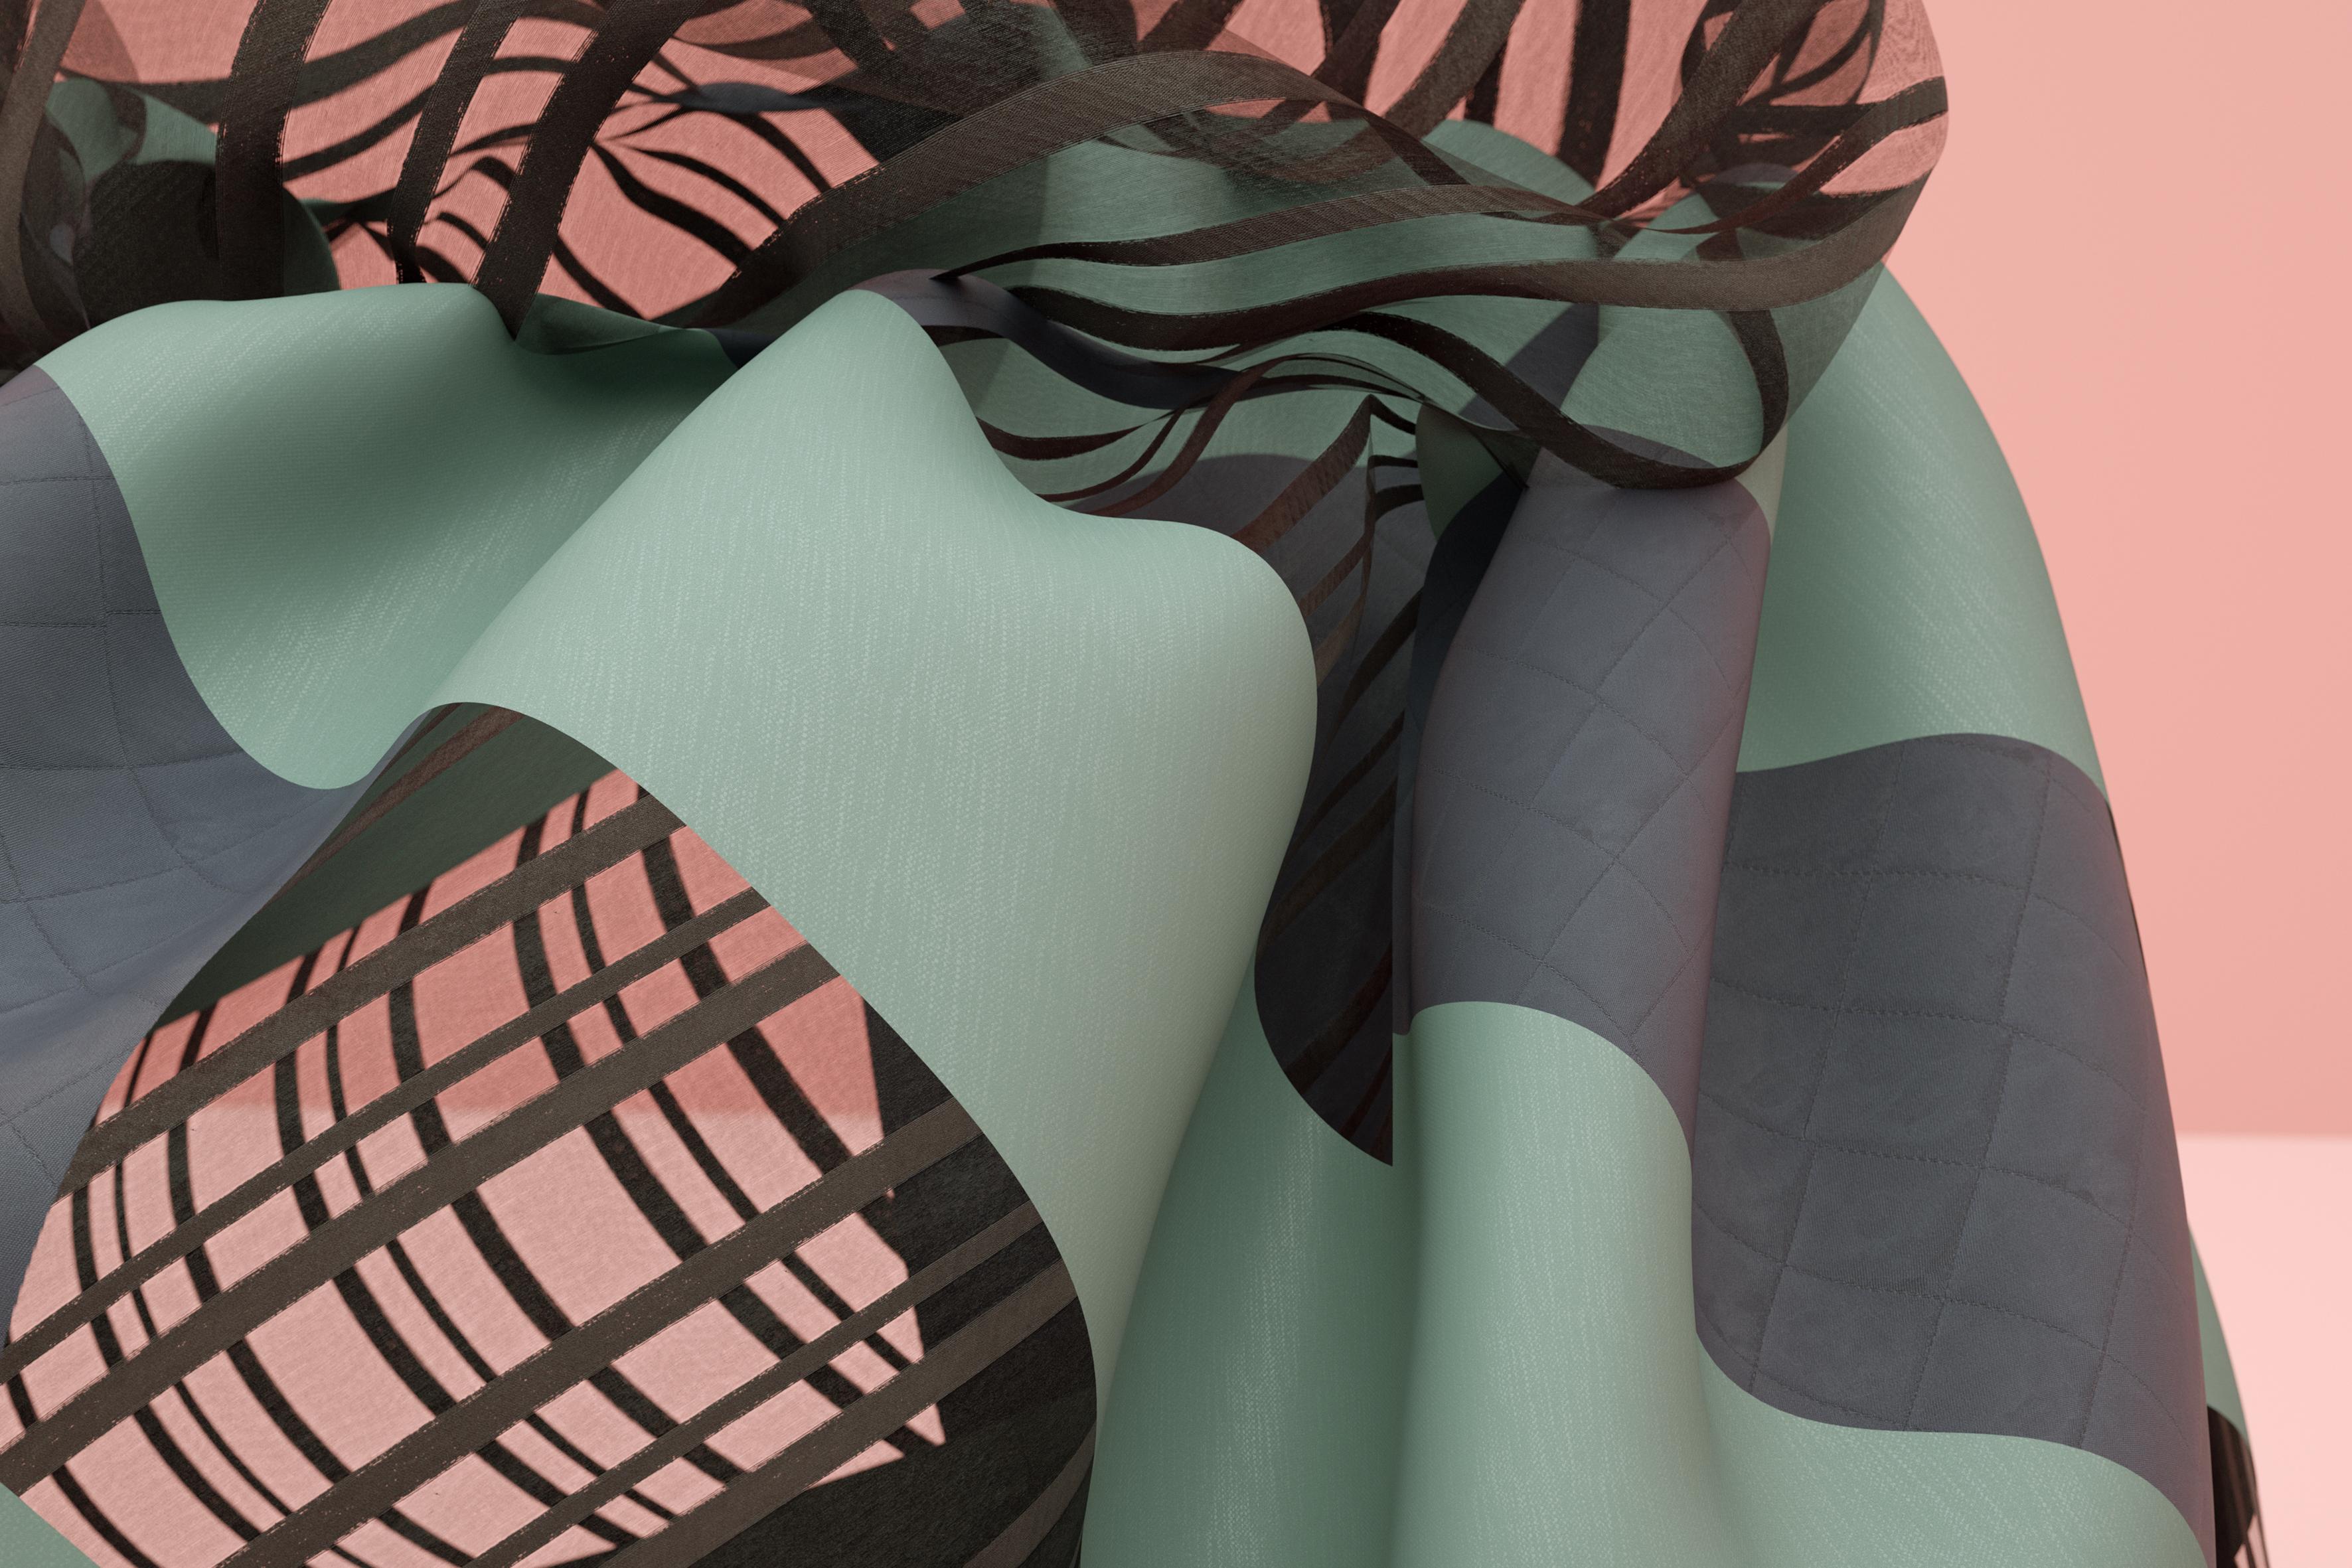 Andreas_Barden_Set_Textilesculpture_Image02